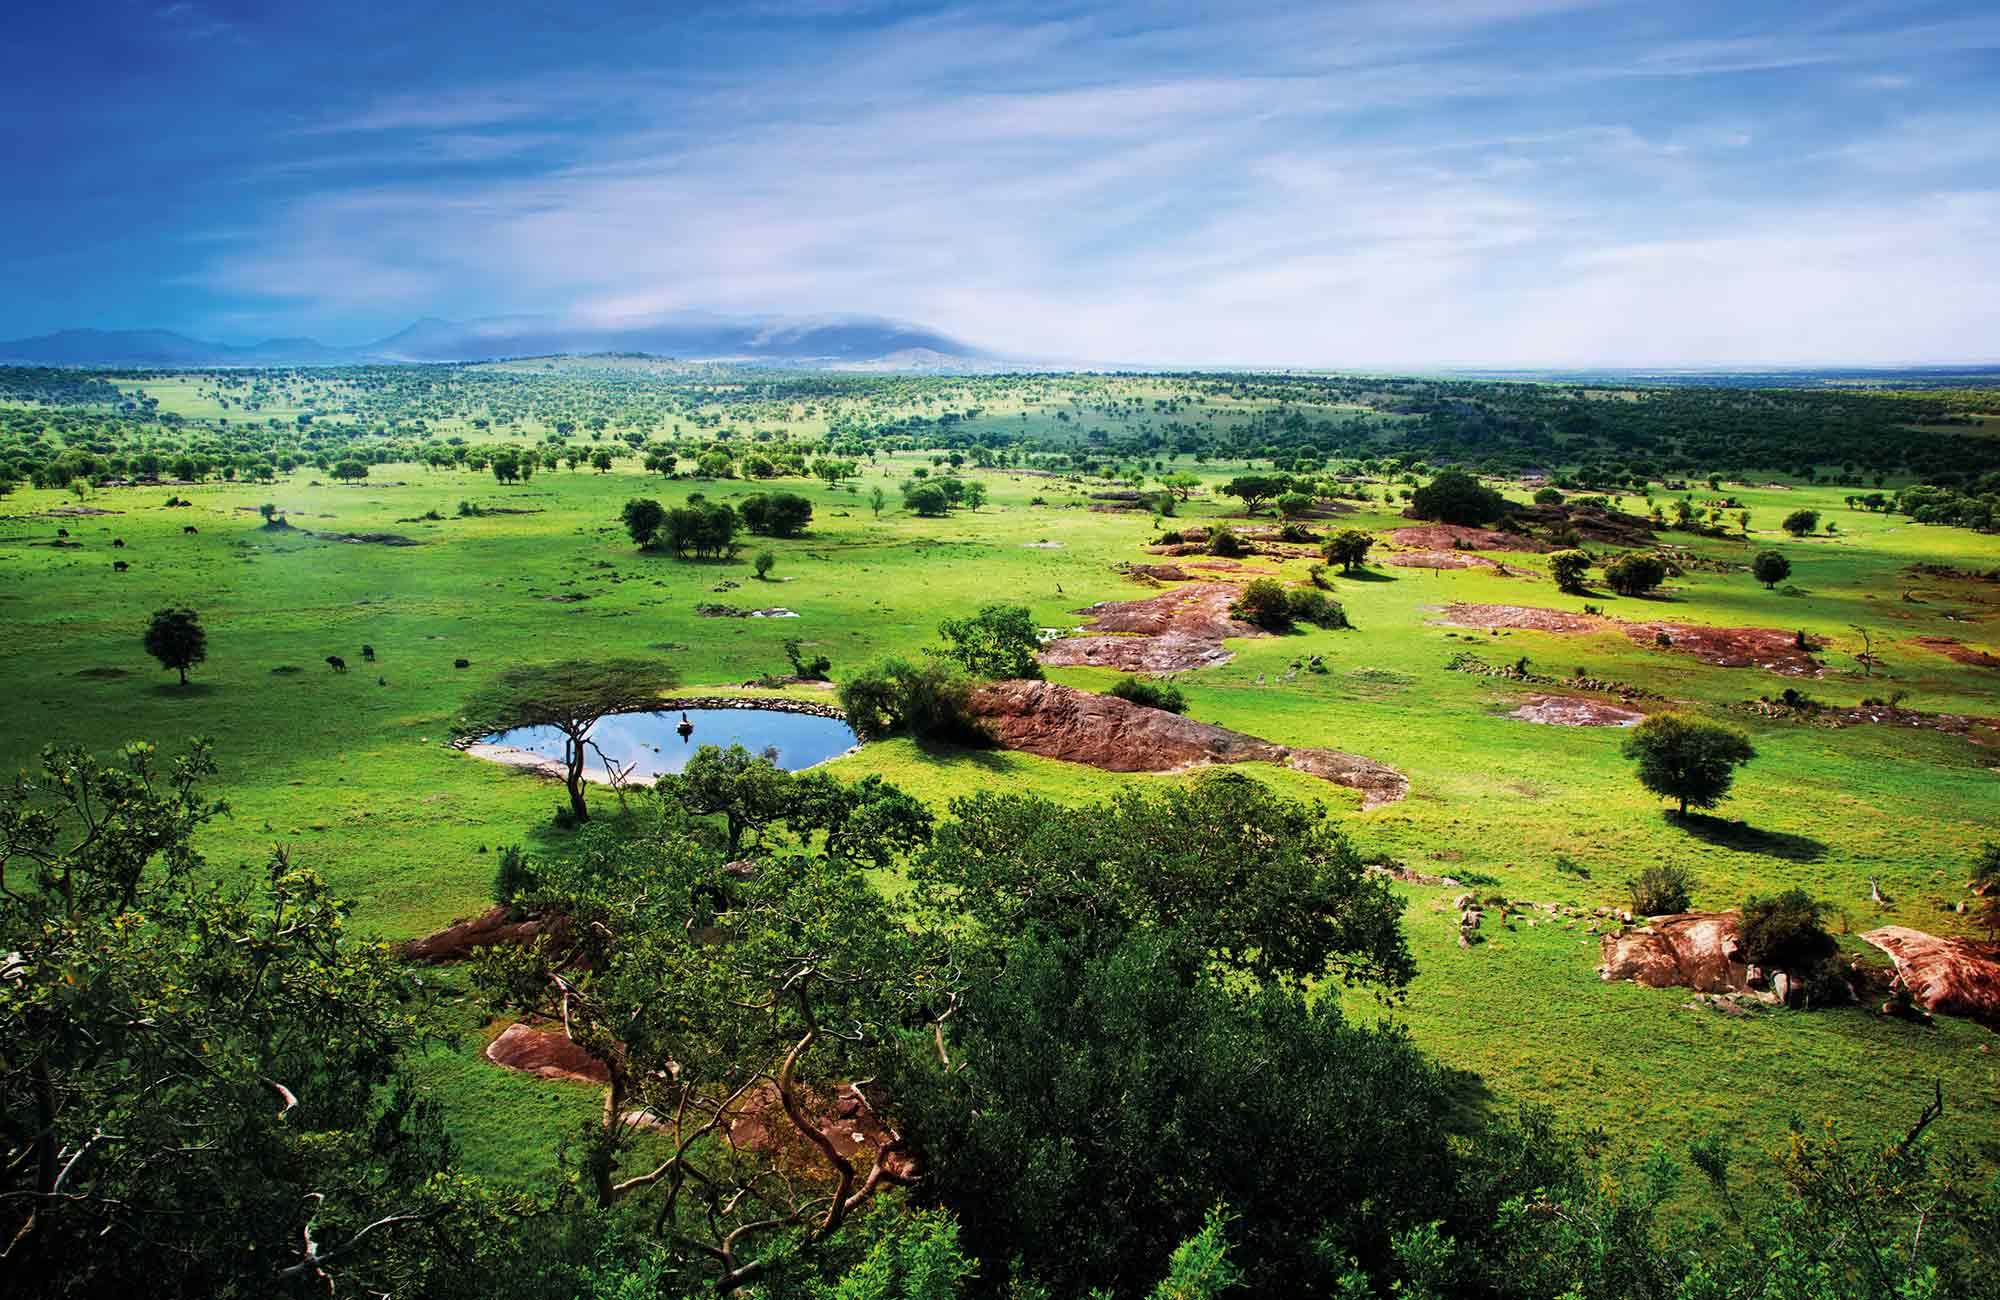 Parc national de Serengeti en Tanzanie par Amplitudes voyage